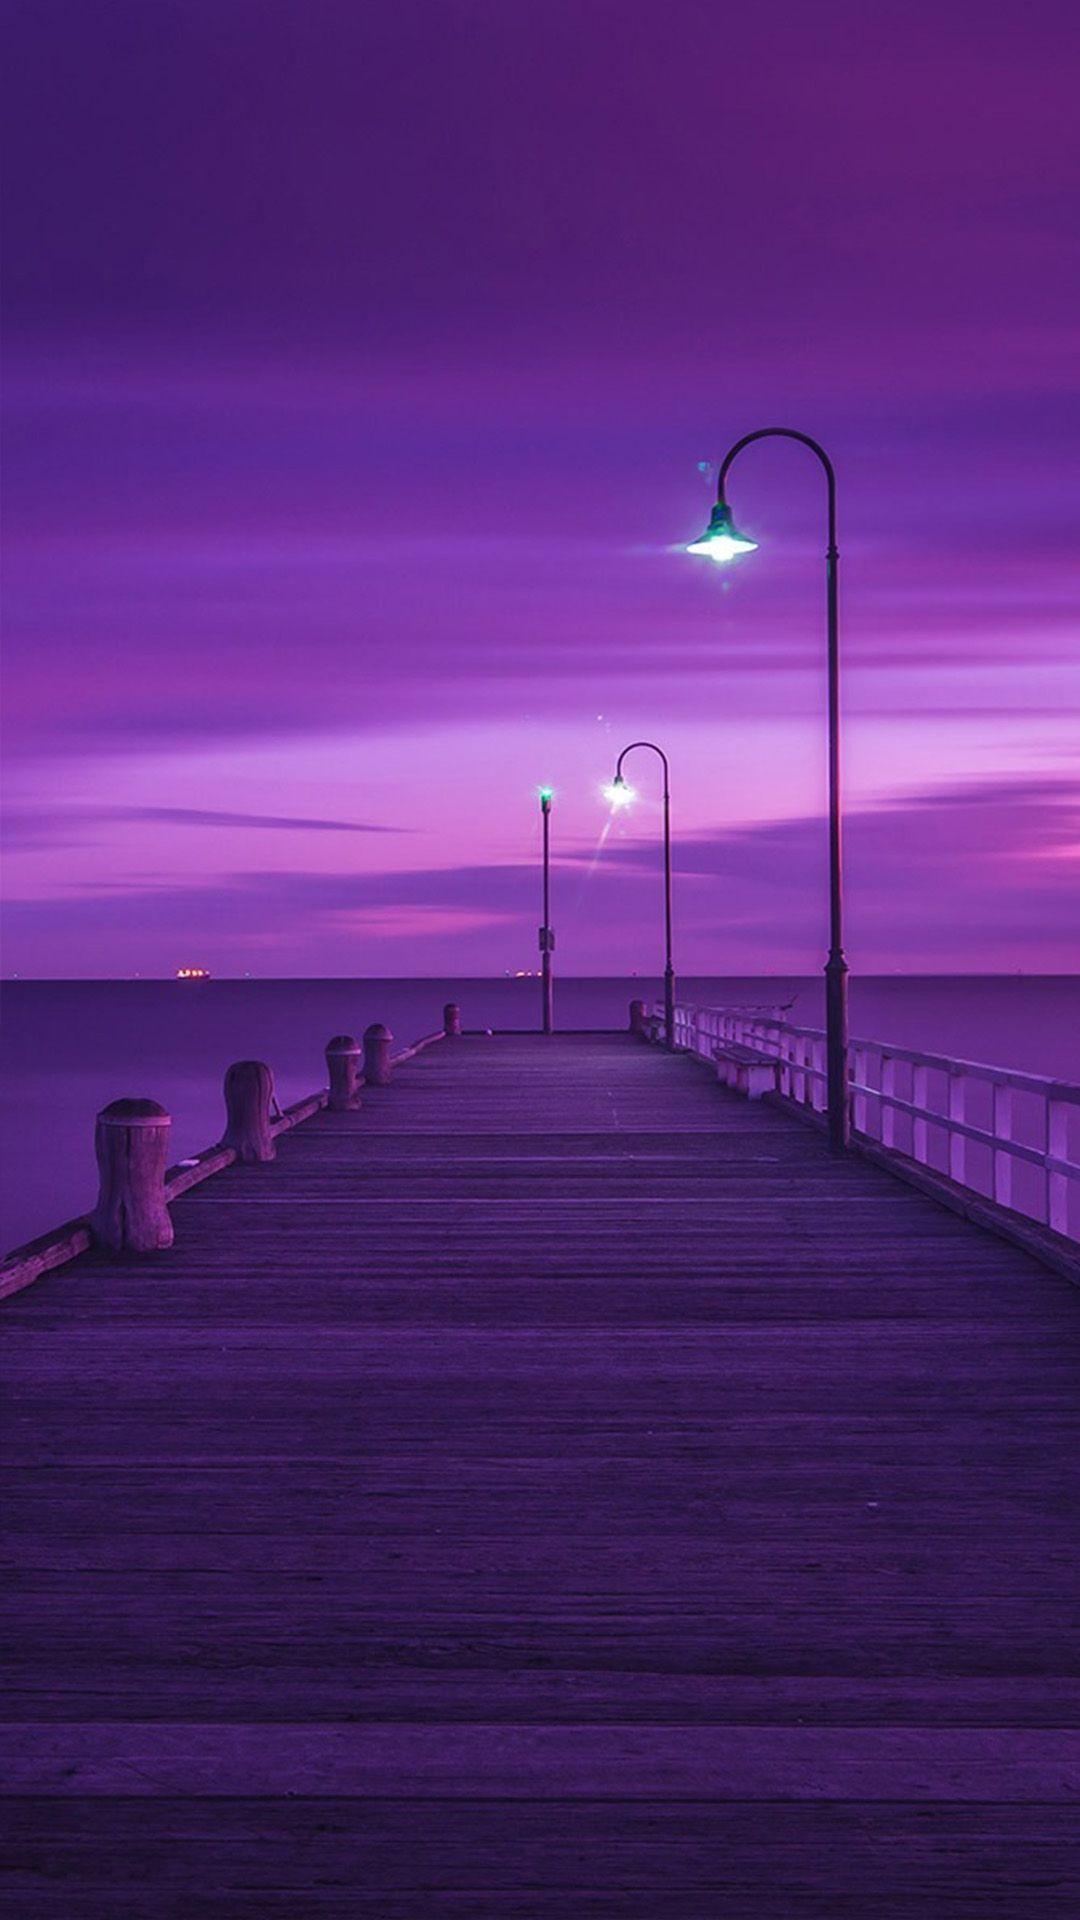 Light Purple Brick Wallpaper Ios in 2020 | Purple ...